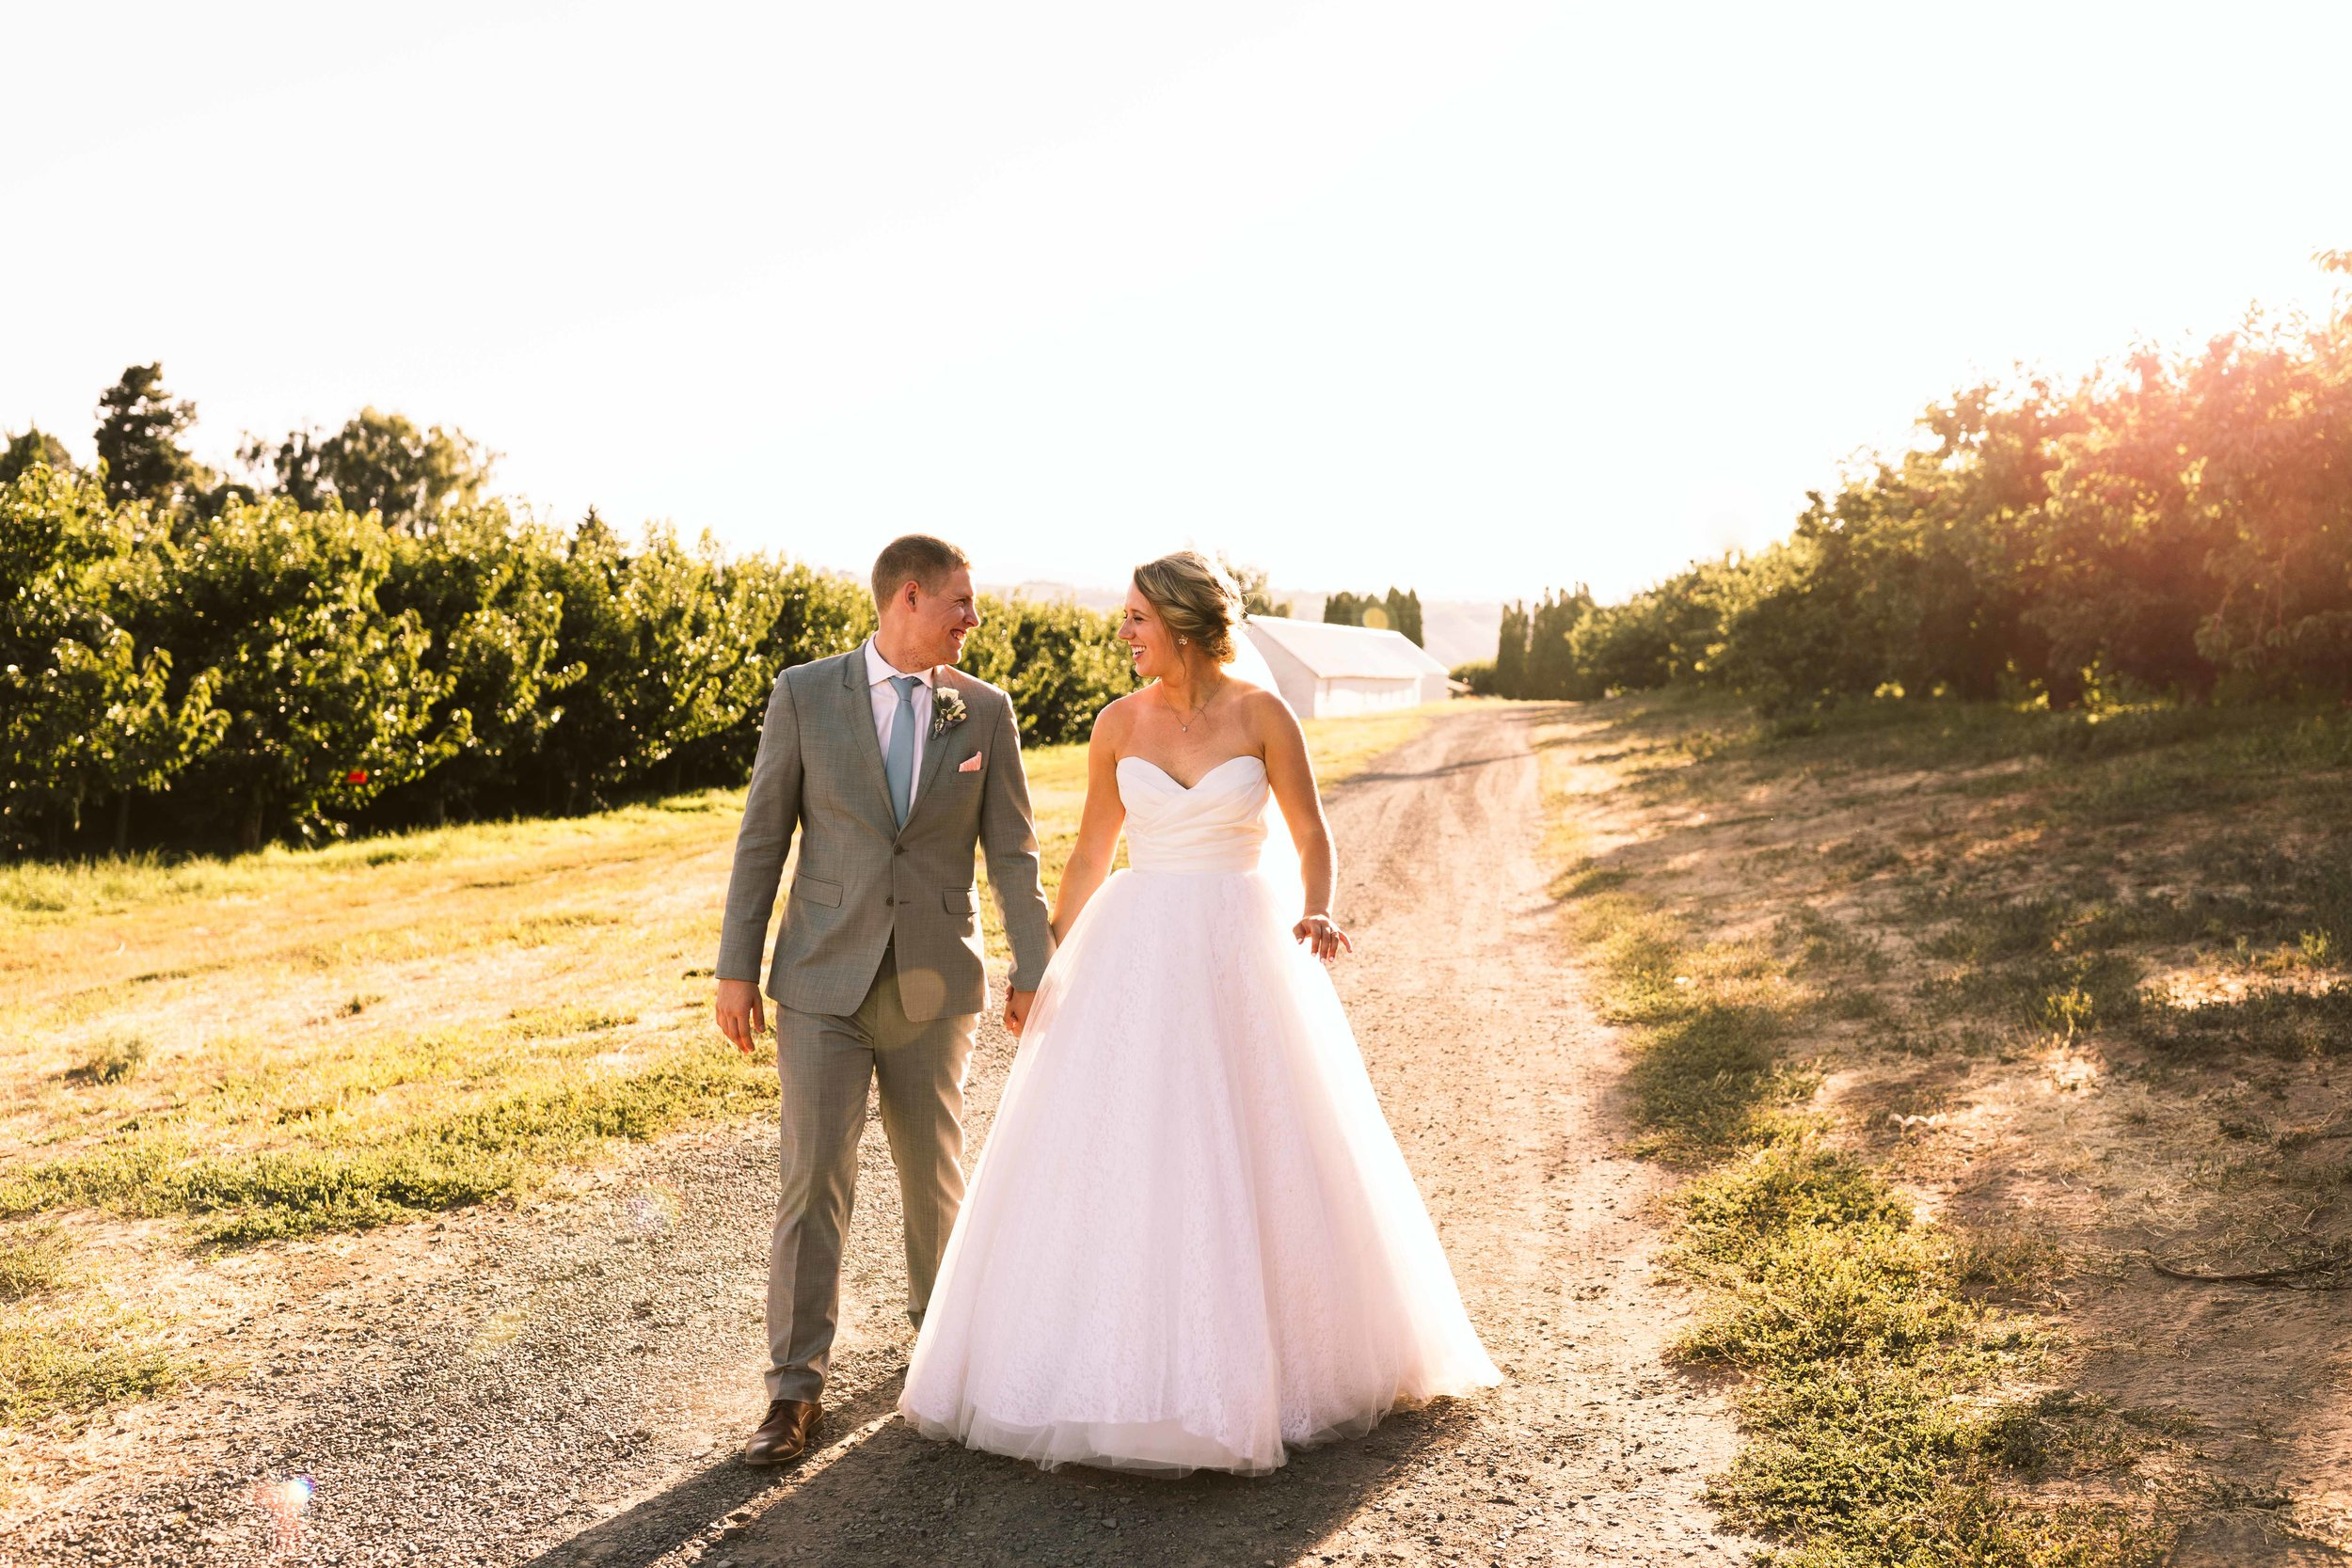 fontaine-estates-wedding-92.jpg